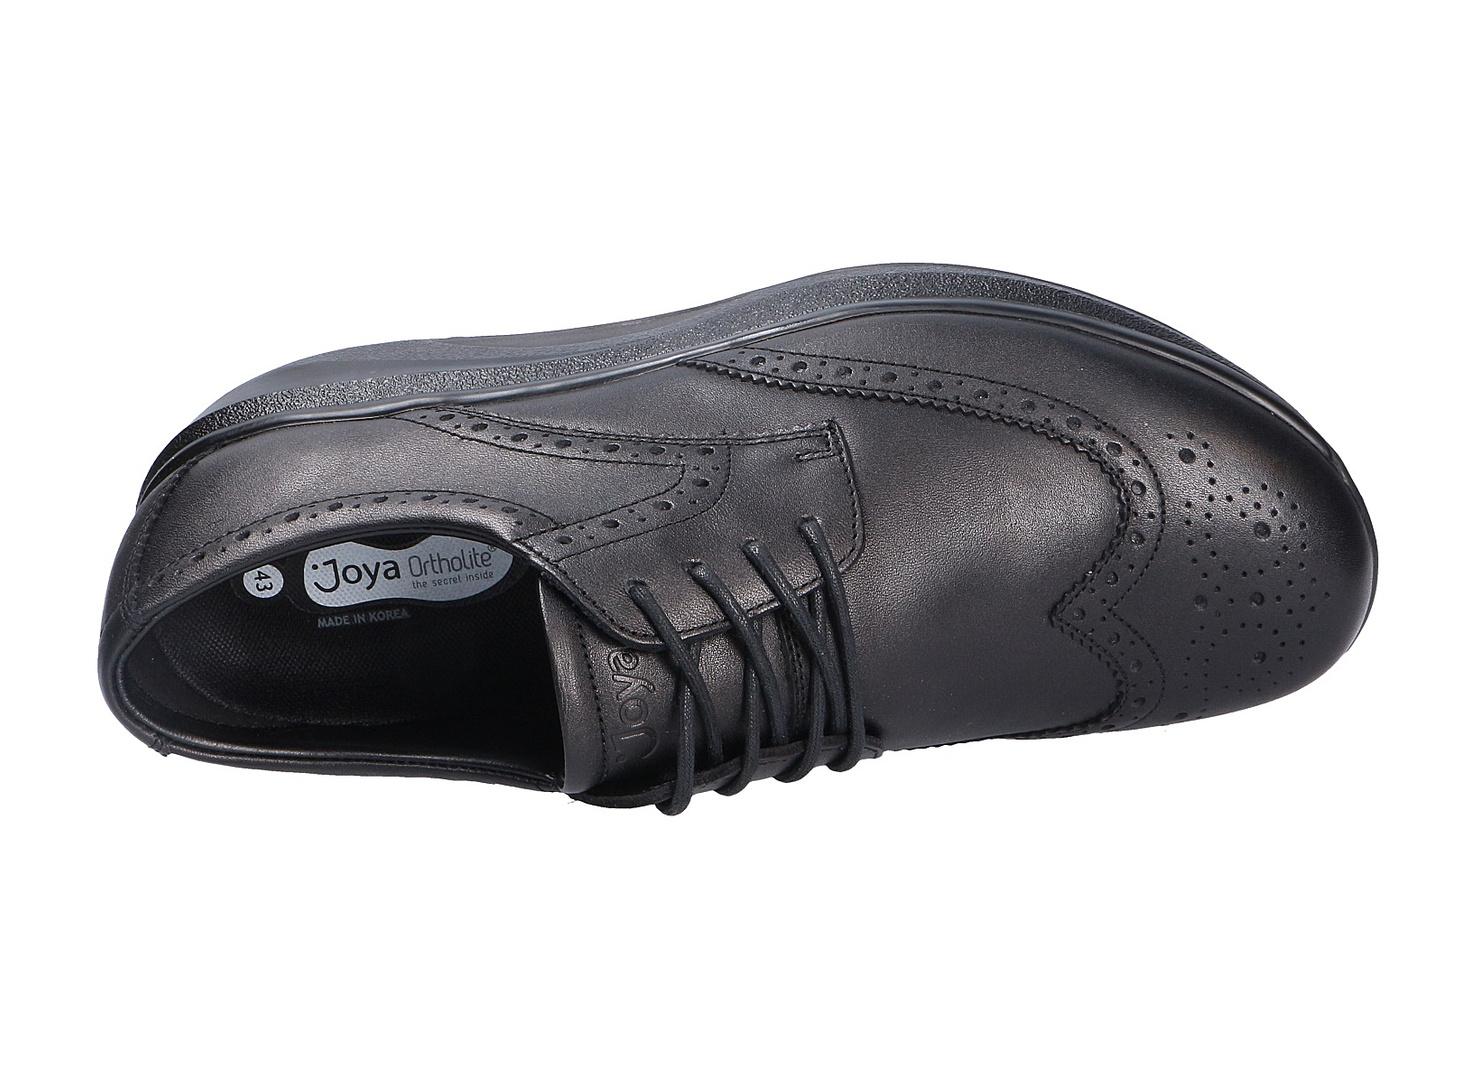 Joya Herren Schnürschuhe | Komfort Schnürschuhe